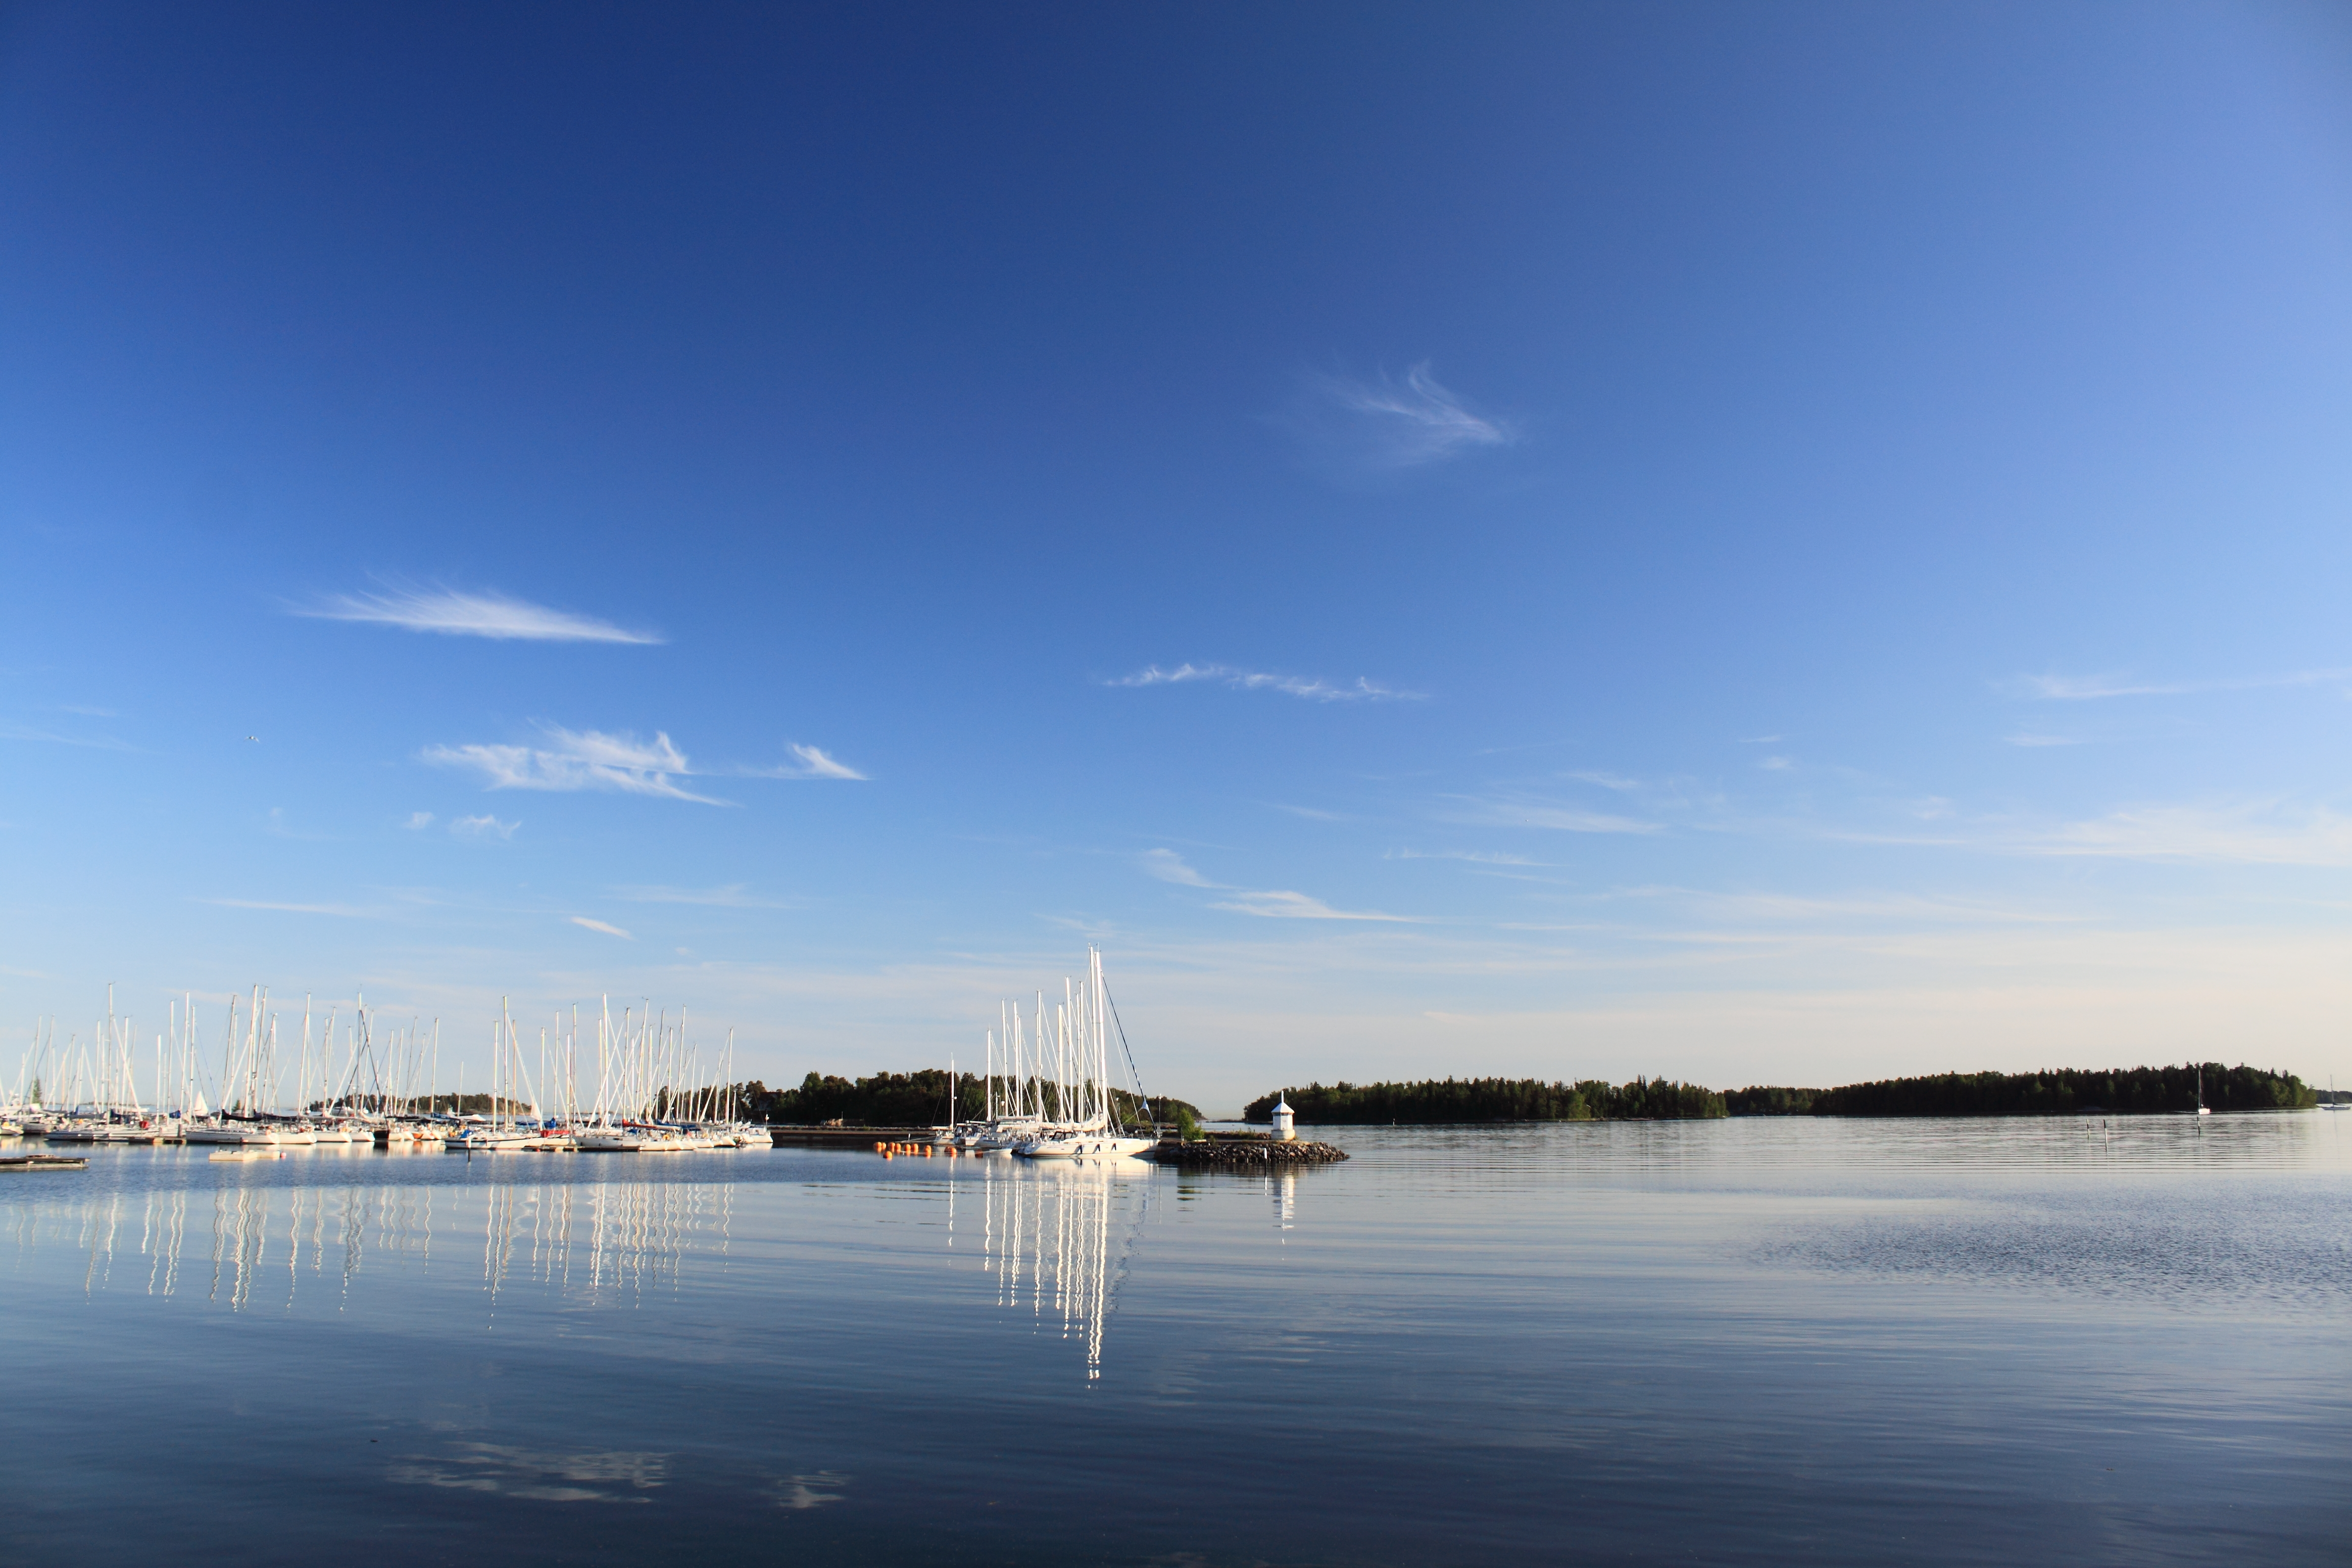 Sea, Blue, Boats, Harbor, Sailboats, HQ Photo